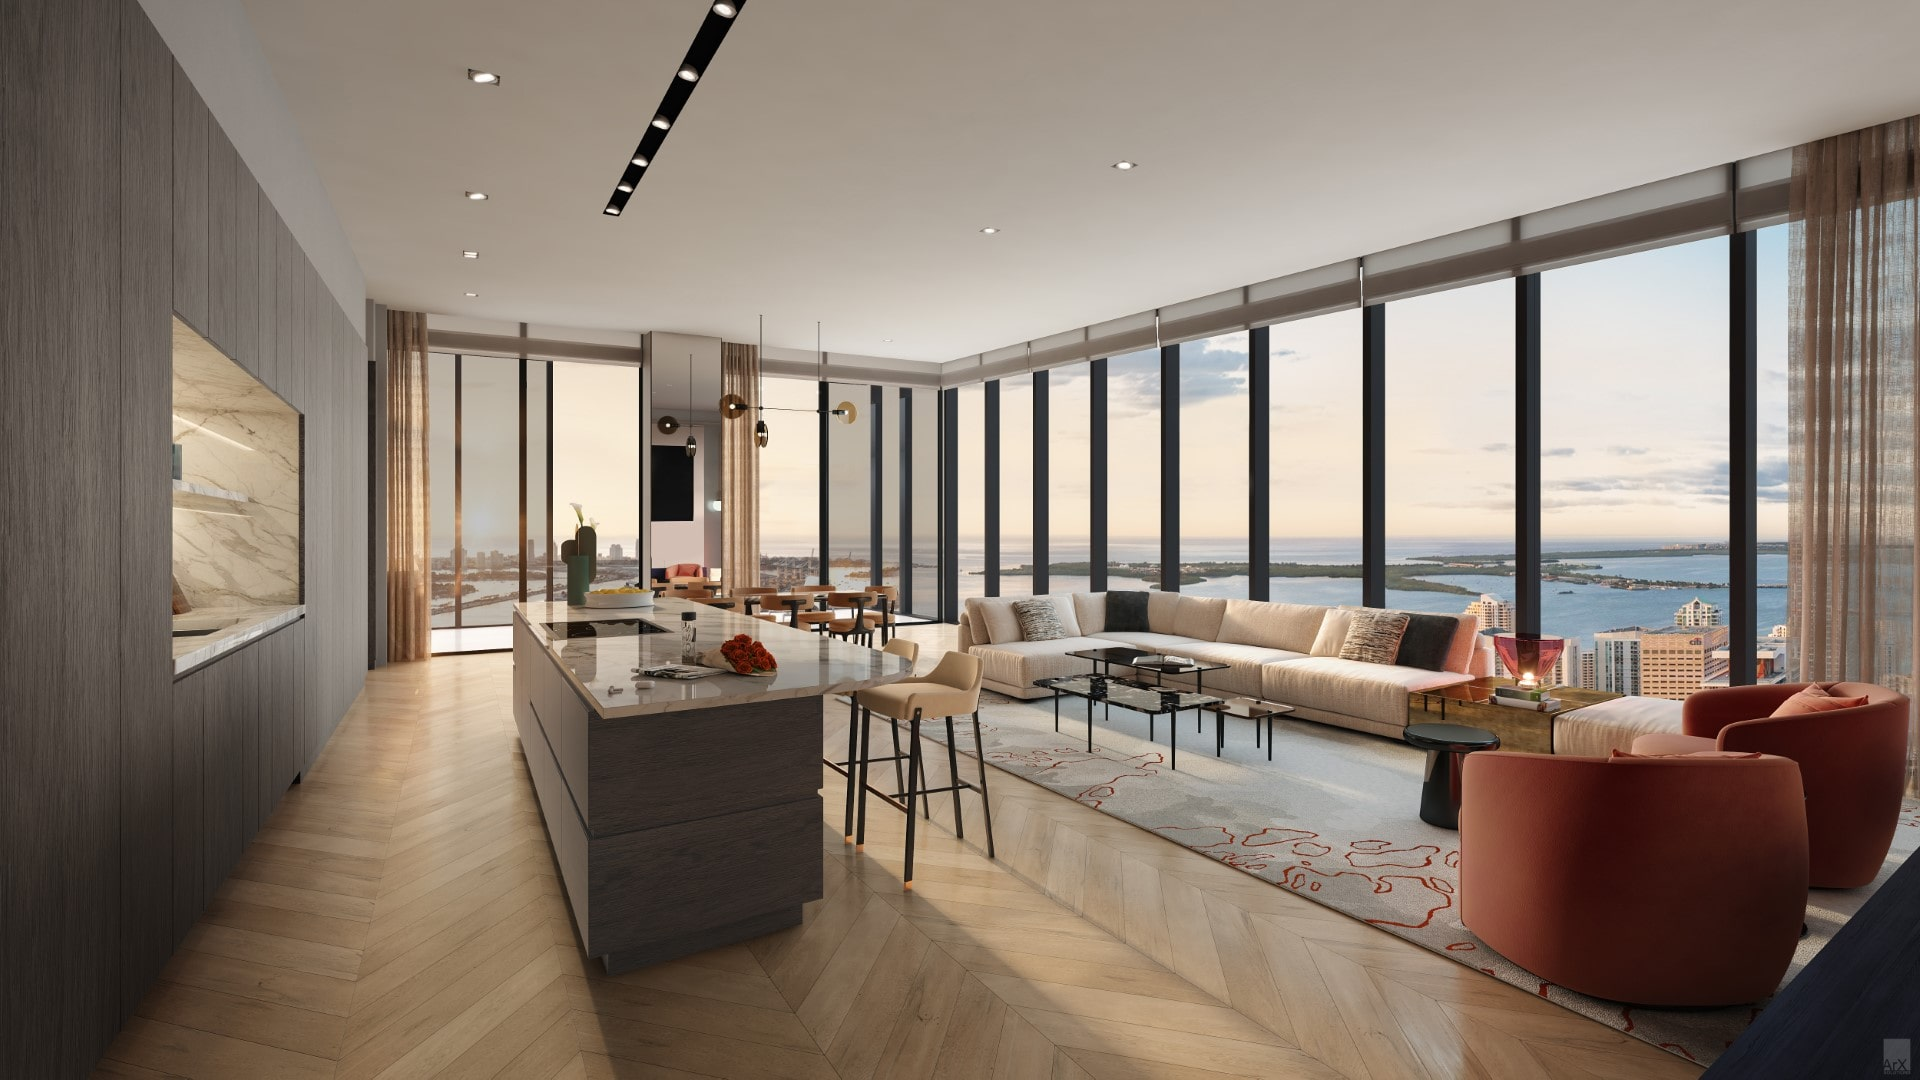 Residential Unit at Waldorf Astoria Miami, interiors by Bamo Interior Design